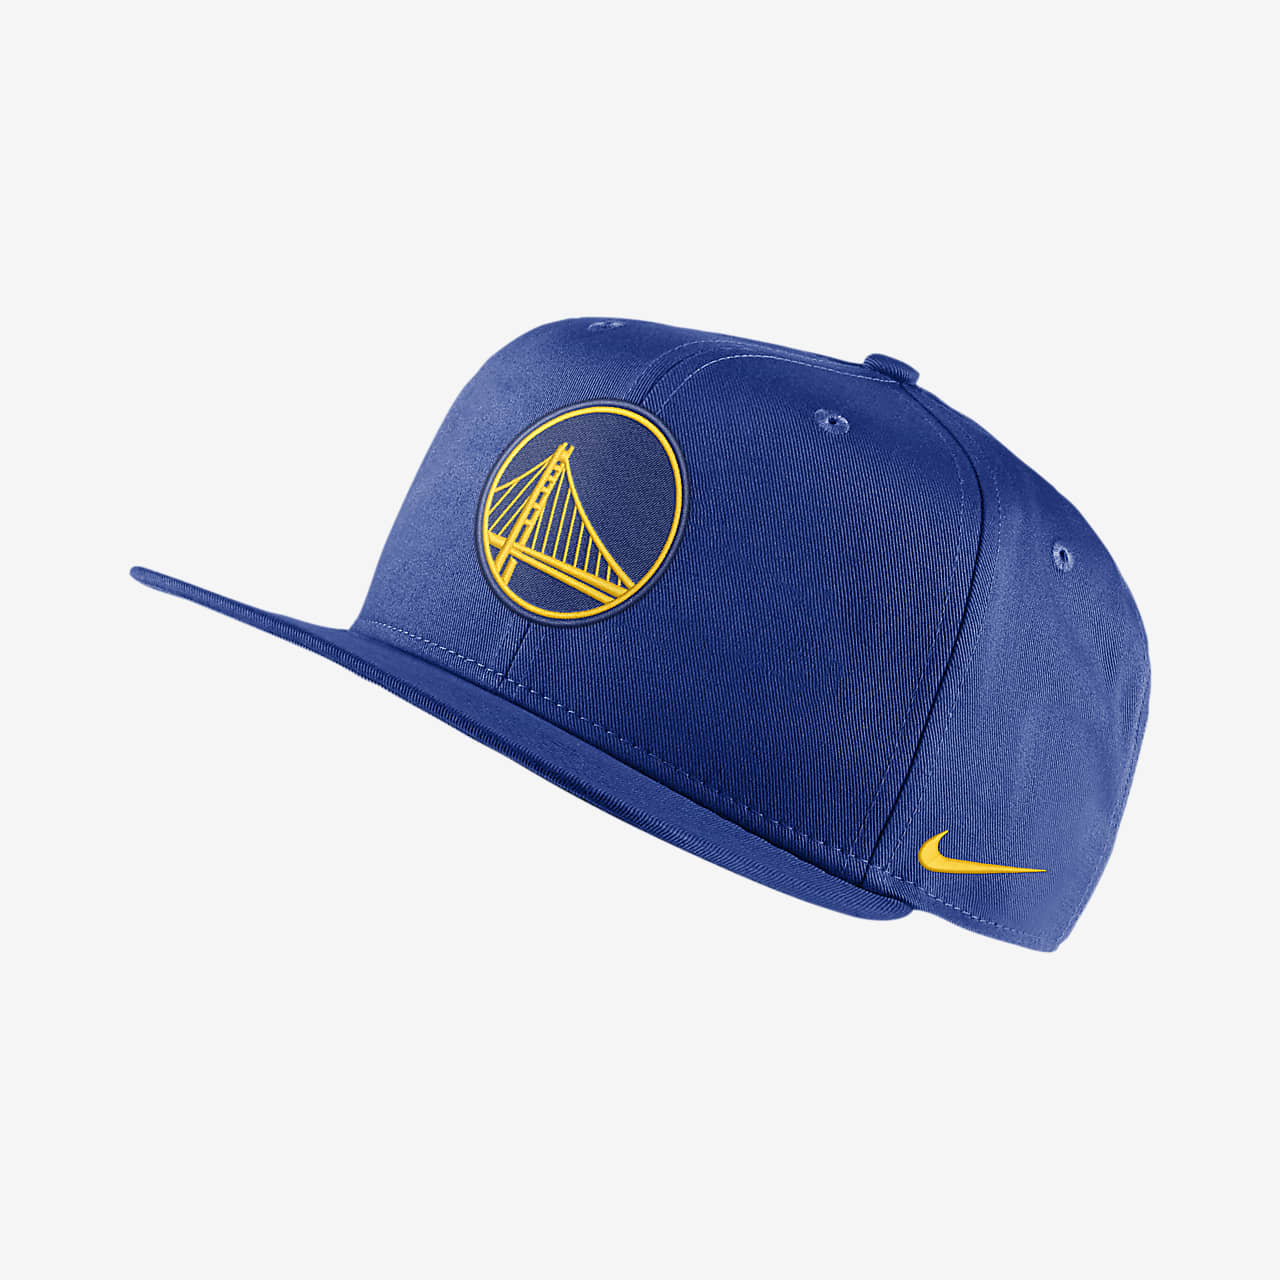 NBA-keps Golden State Warriors Nike Pro